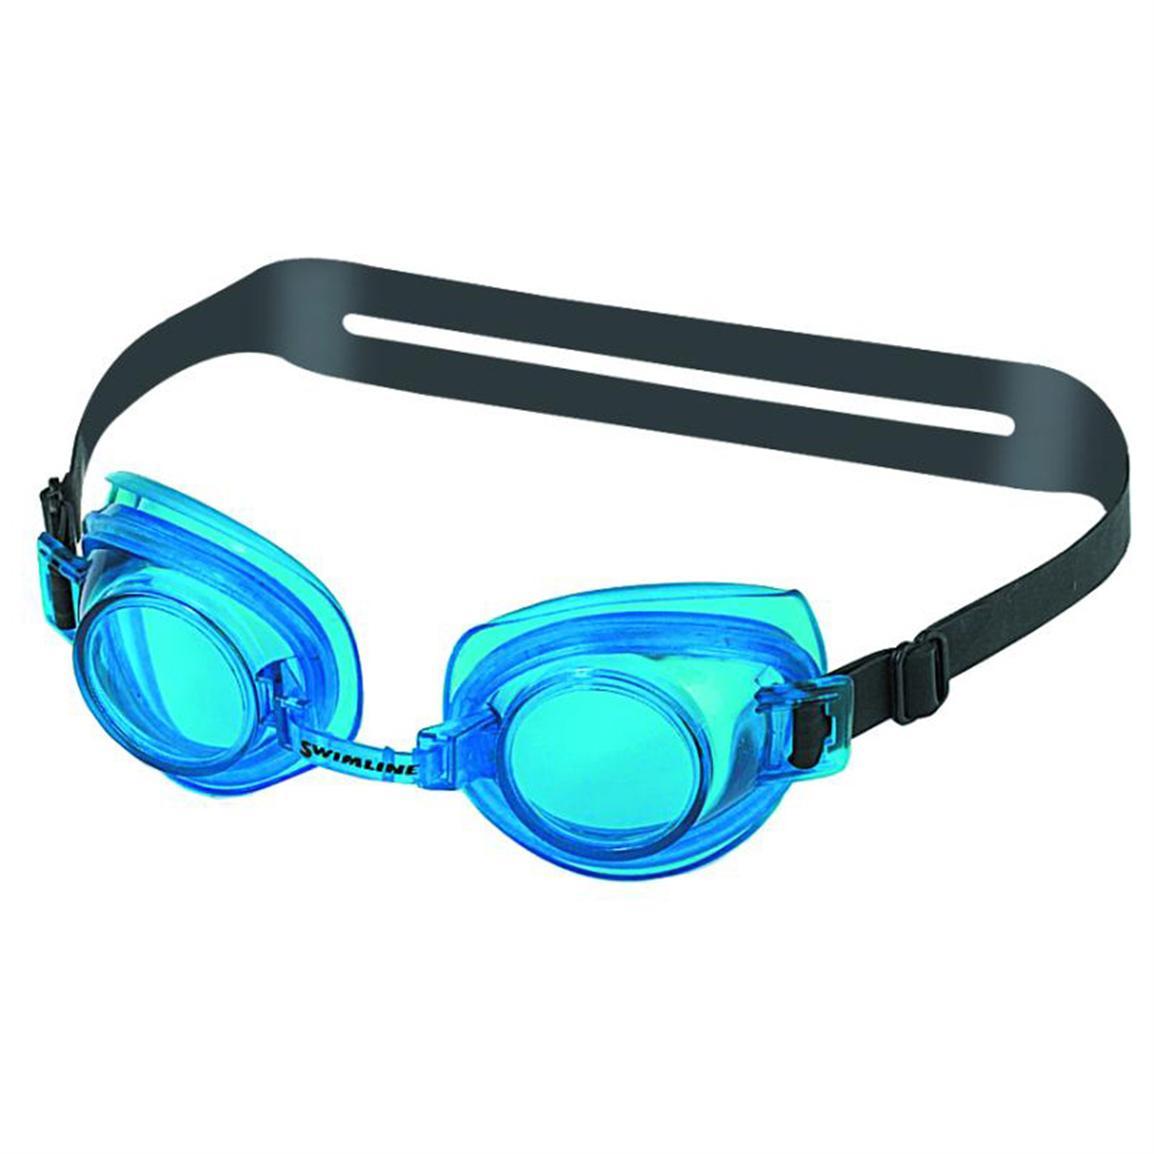 1154x1154 Swim Goggles Clipart Free Images